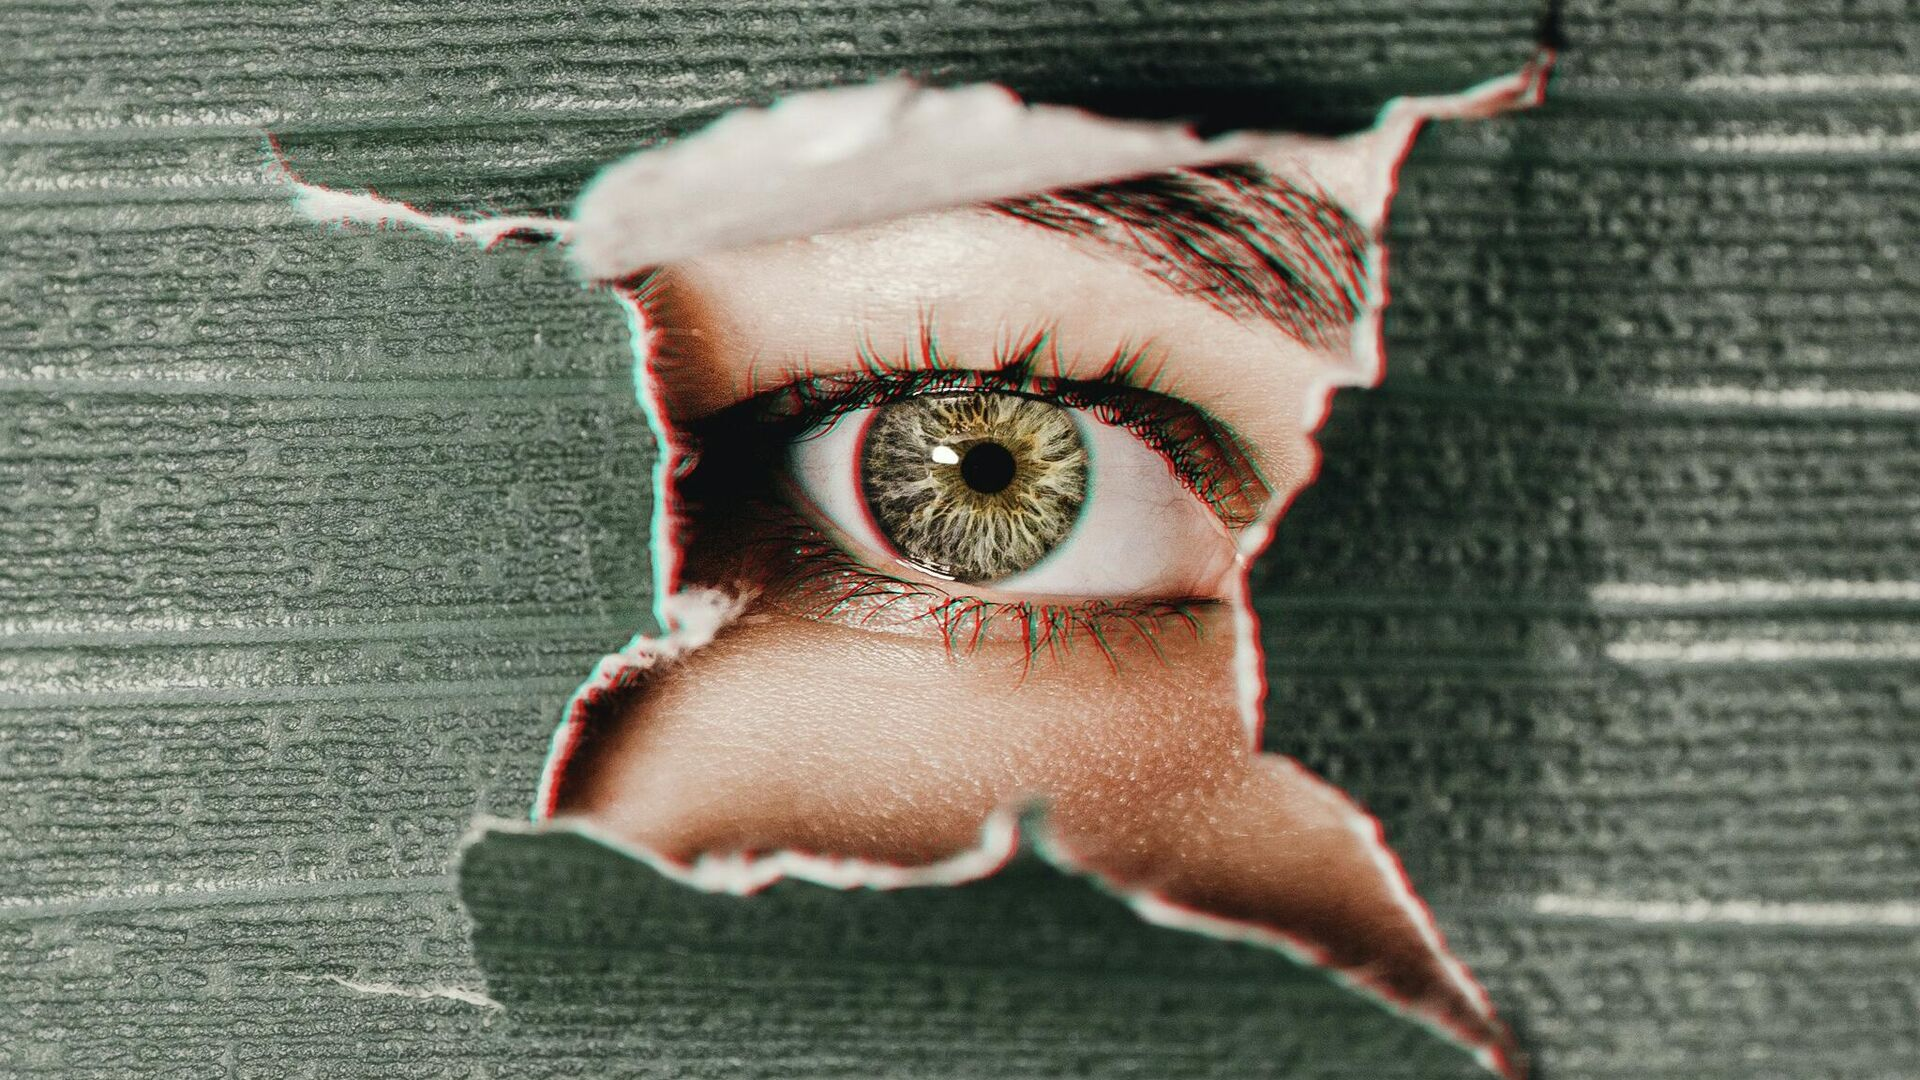 Un ojo, imagen ilustrativa - Sputnik Mundo, 1920, 04.03.2021